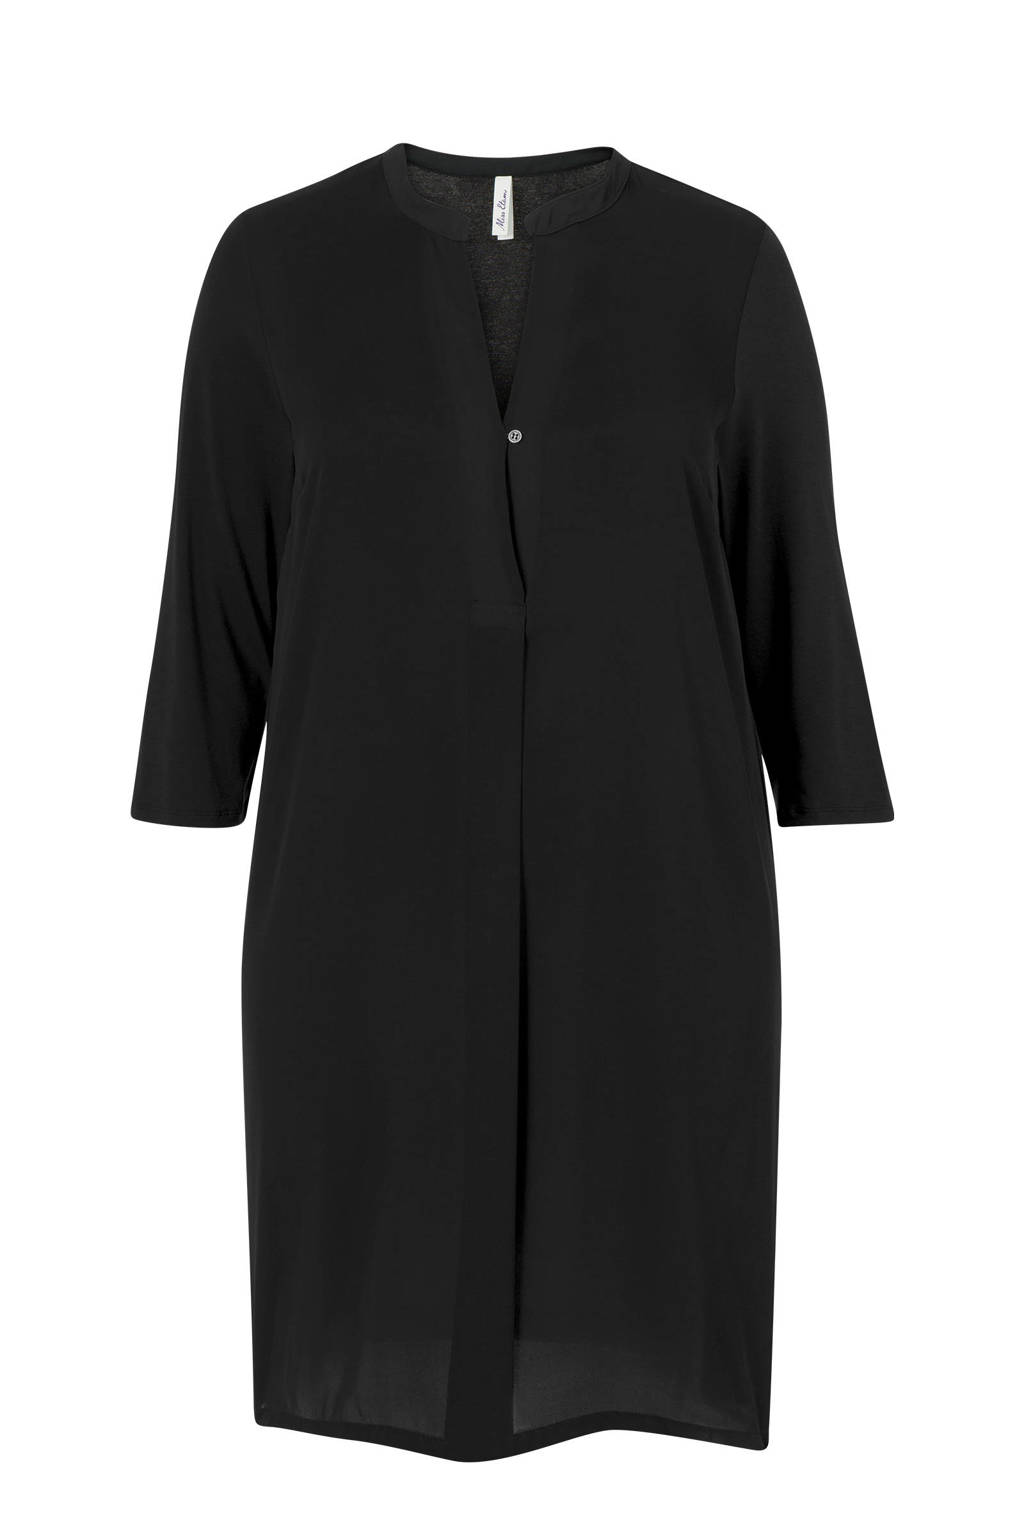 Miss Etam Plus jurk zwart, Zwart